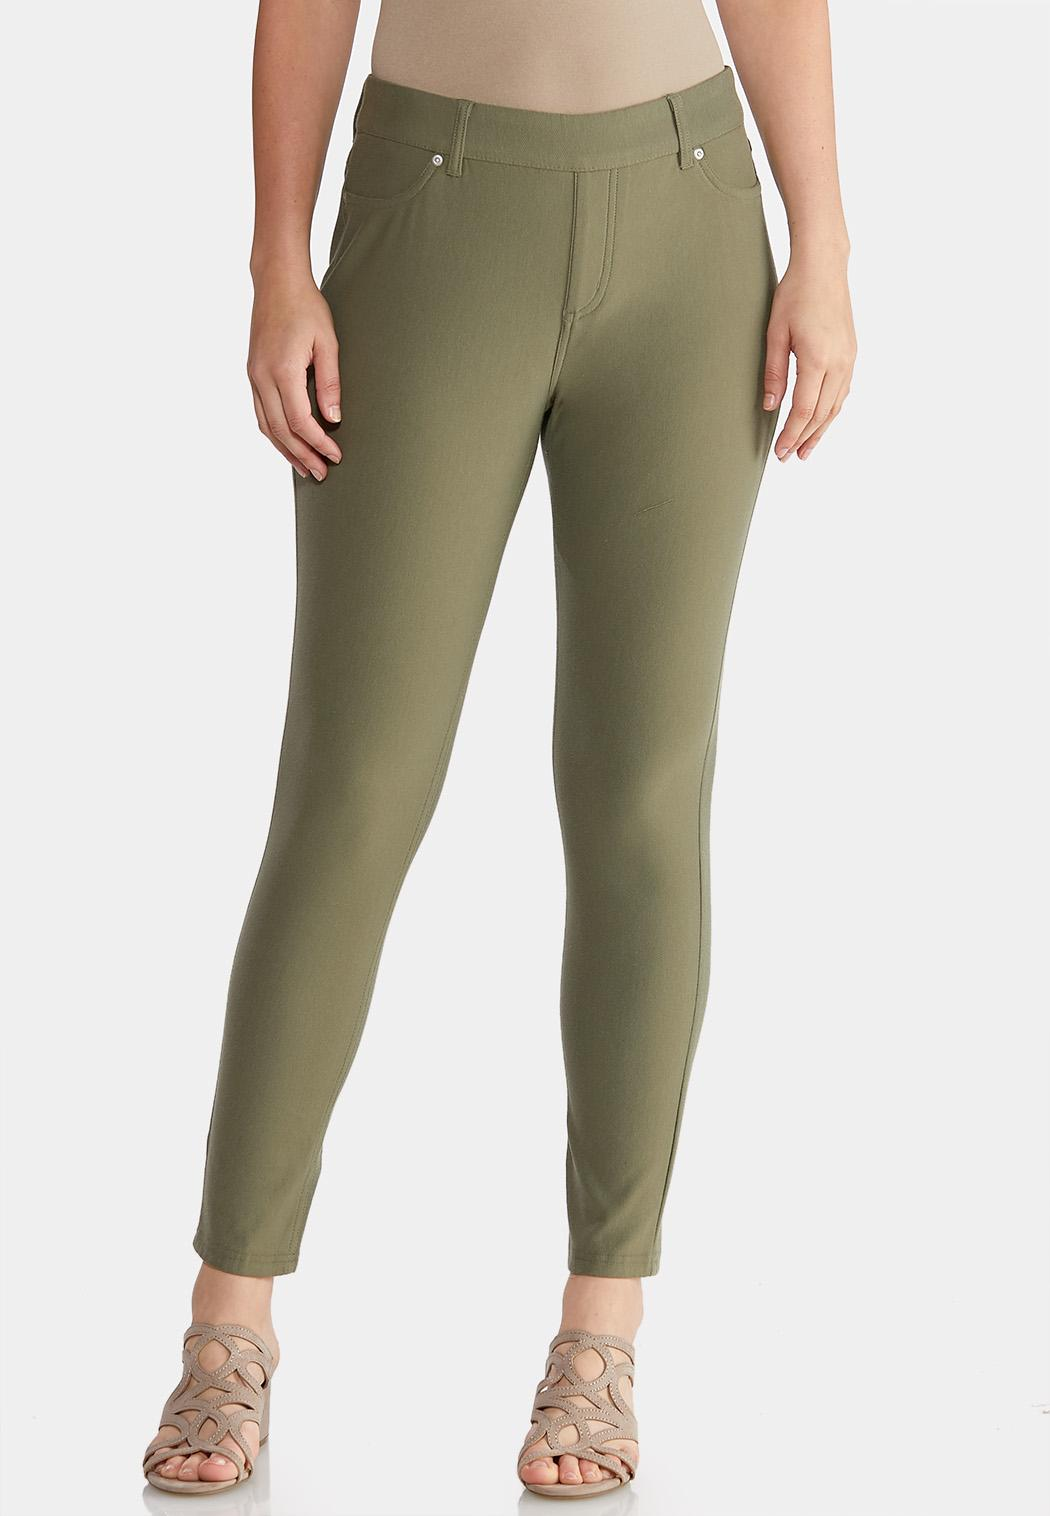 Petite Skinny Knit Pants